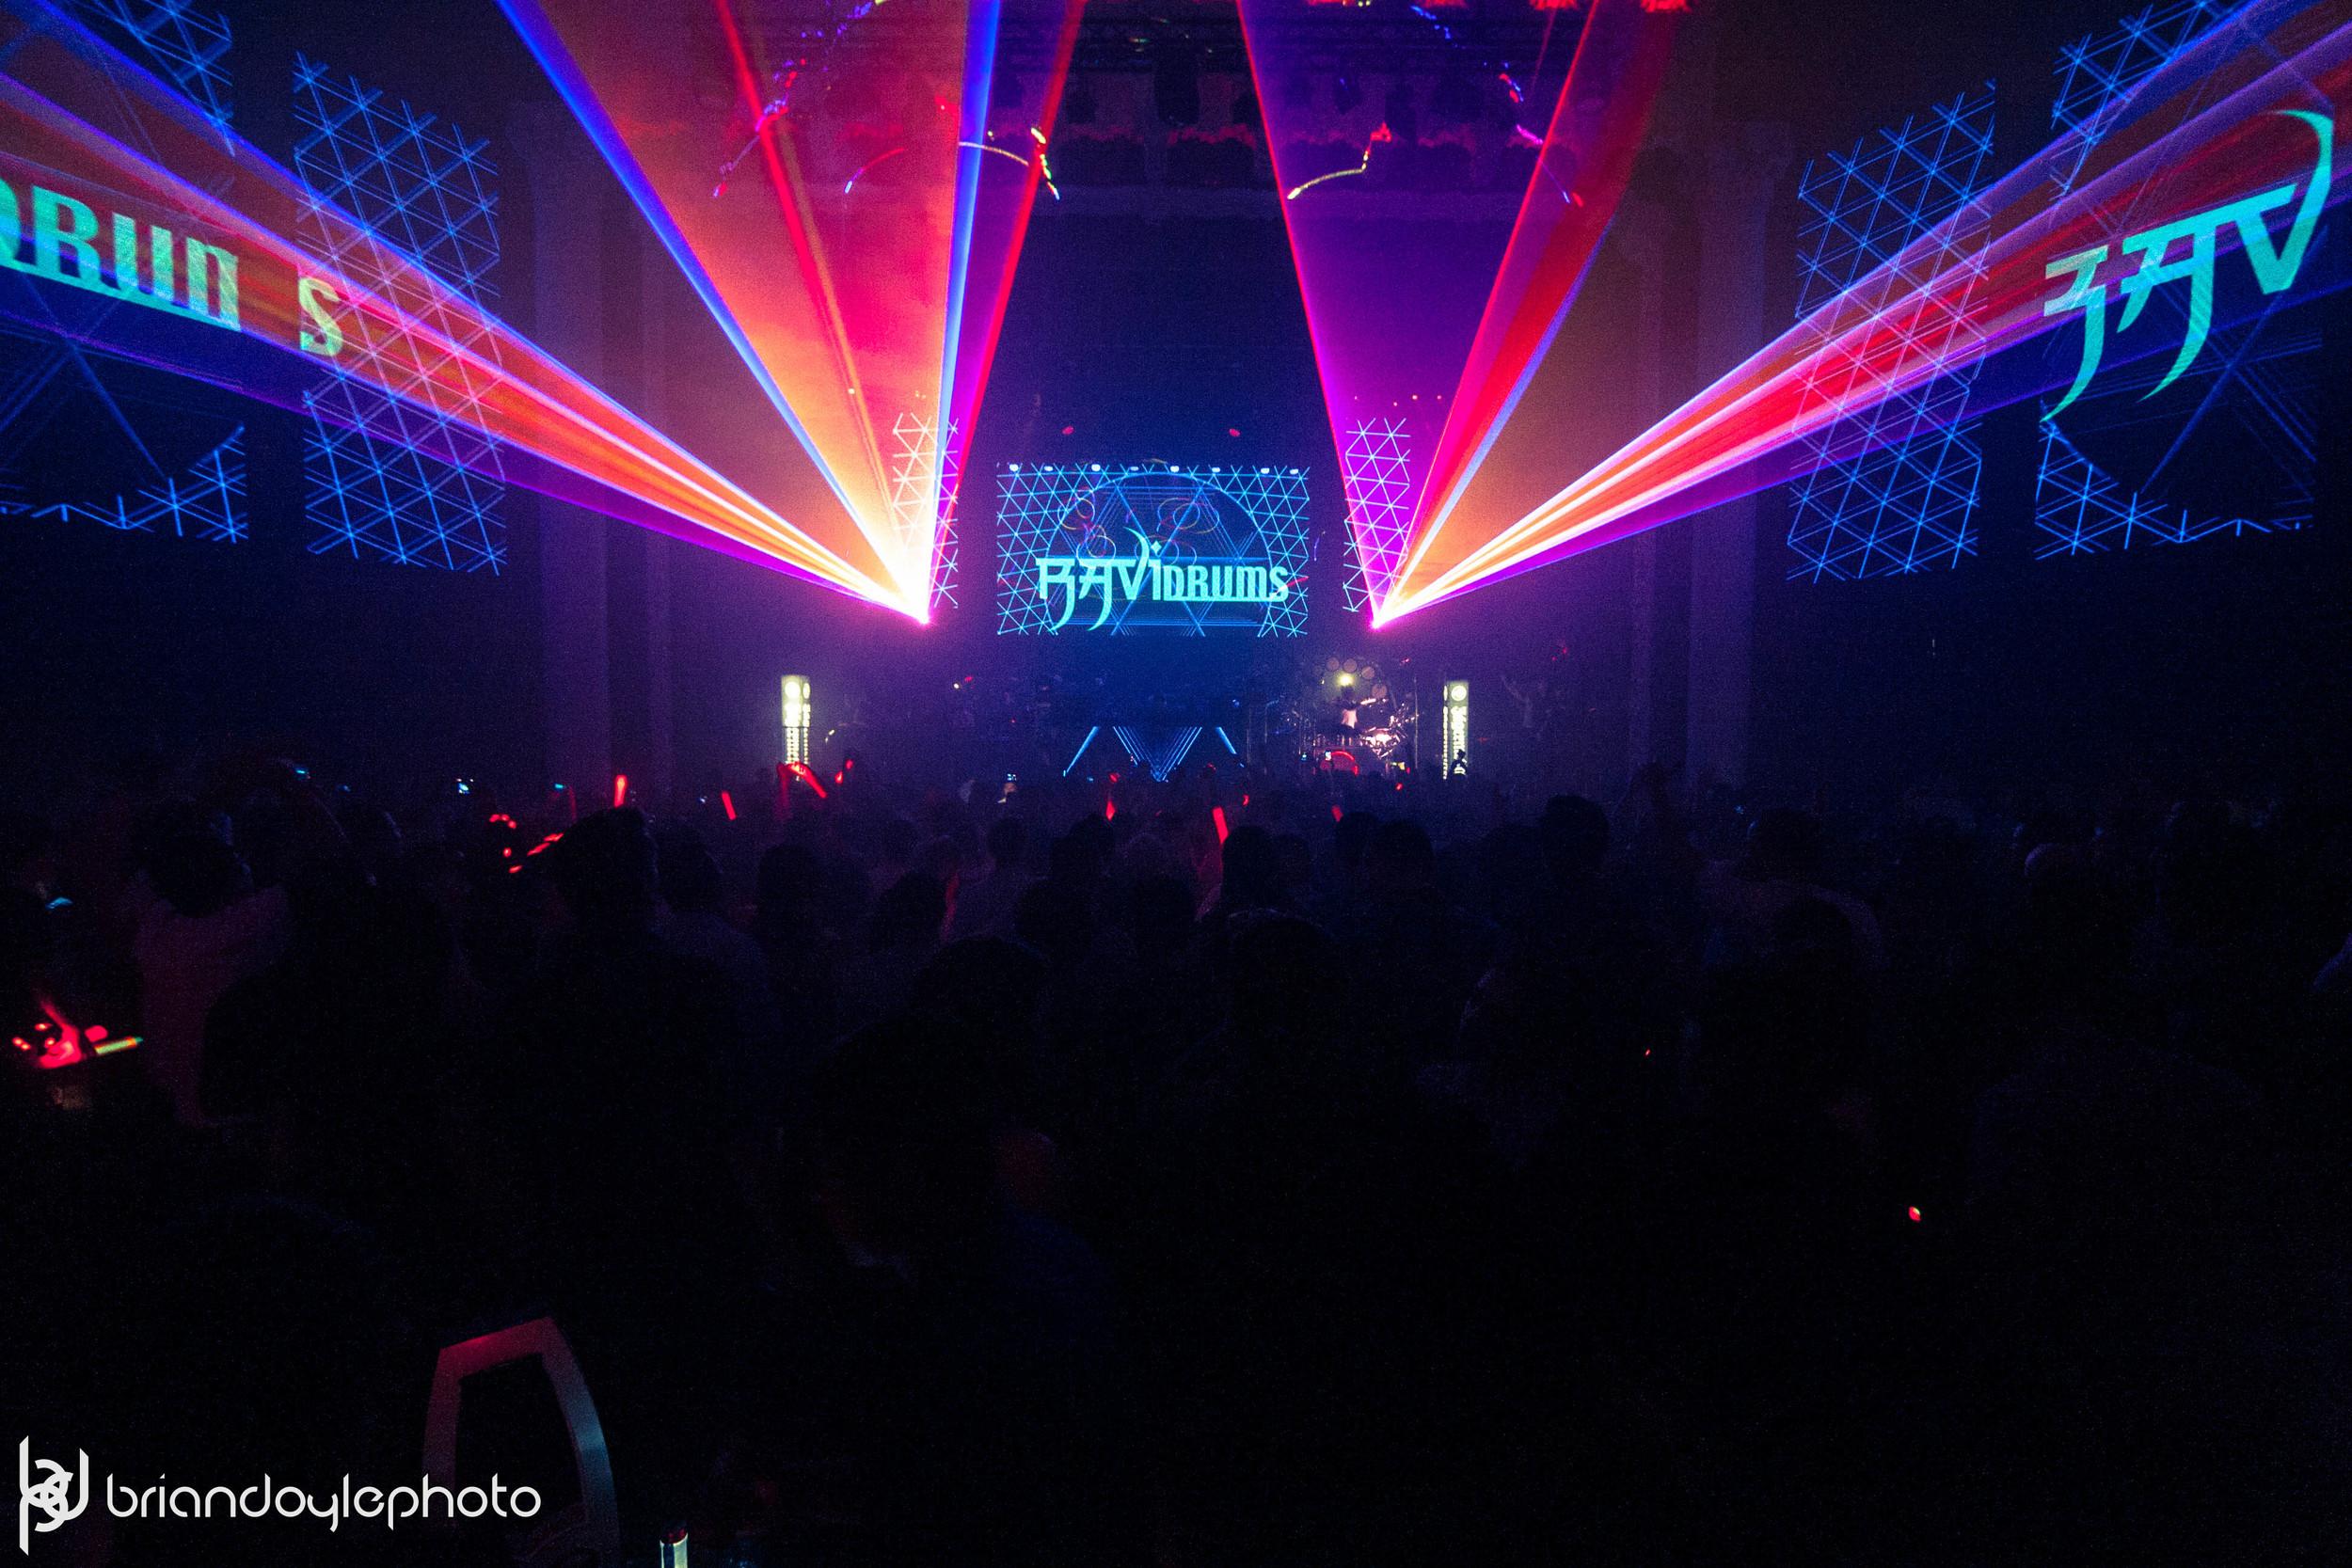 Jagermeister Presents - Paul Oakenfold @ Avalon bdp 27.09.14-31.jpg